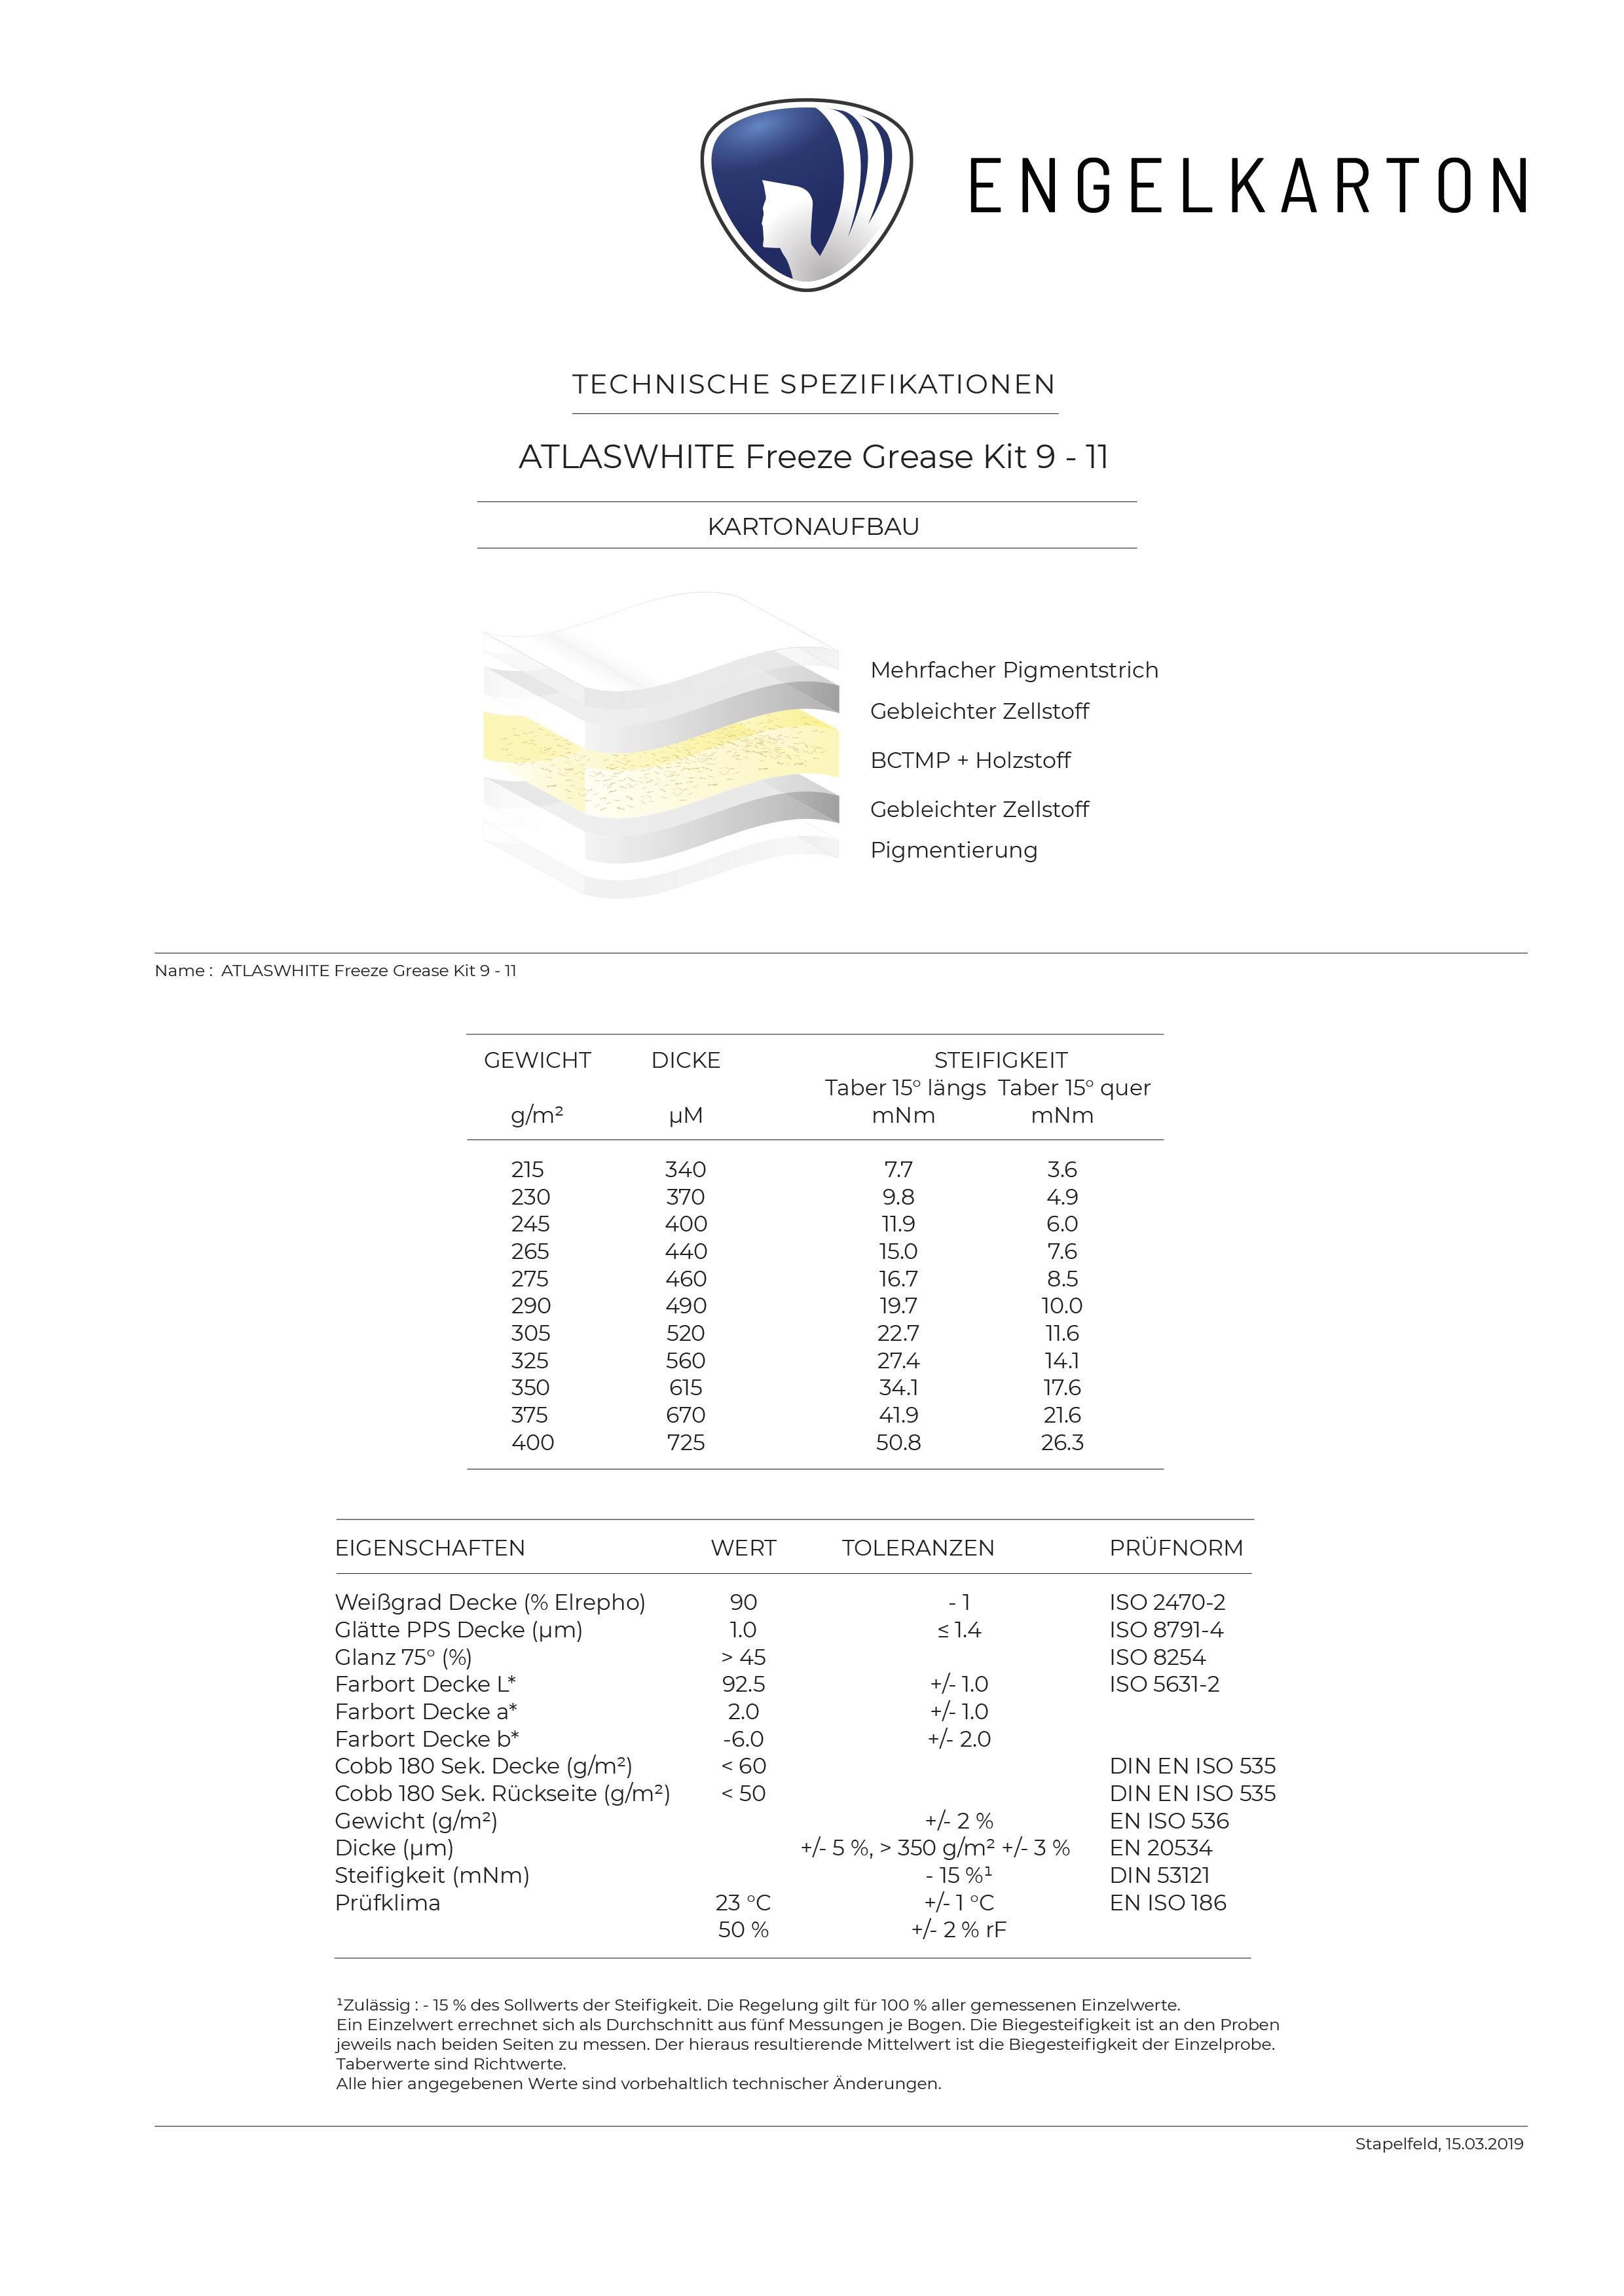 ATLASWHITE Freeze Grease Kit 9-11_web